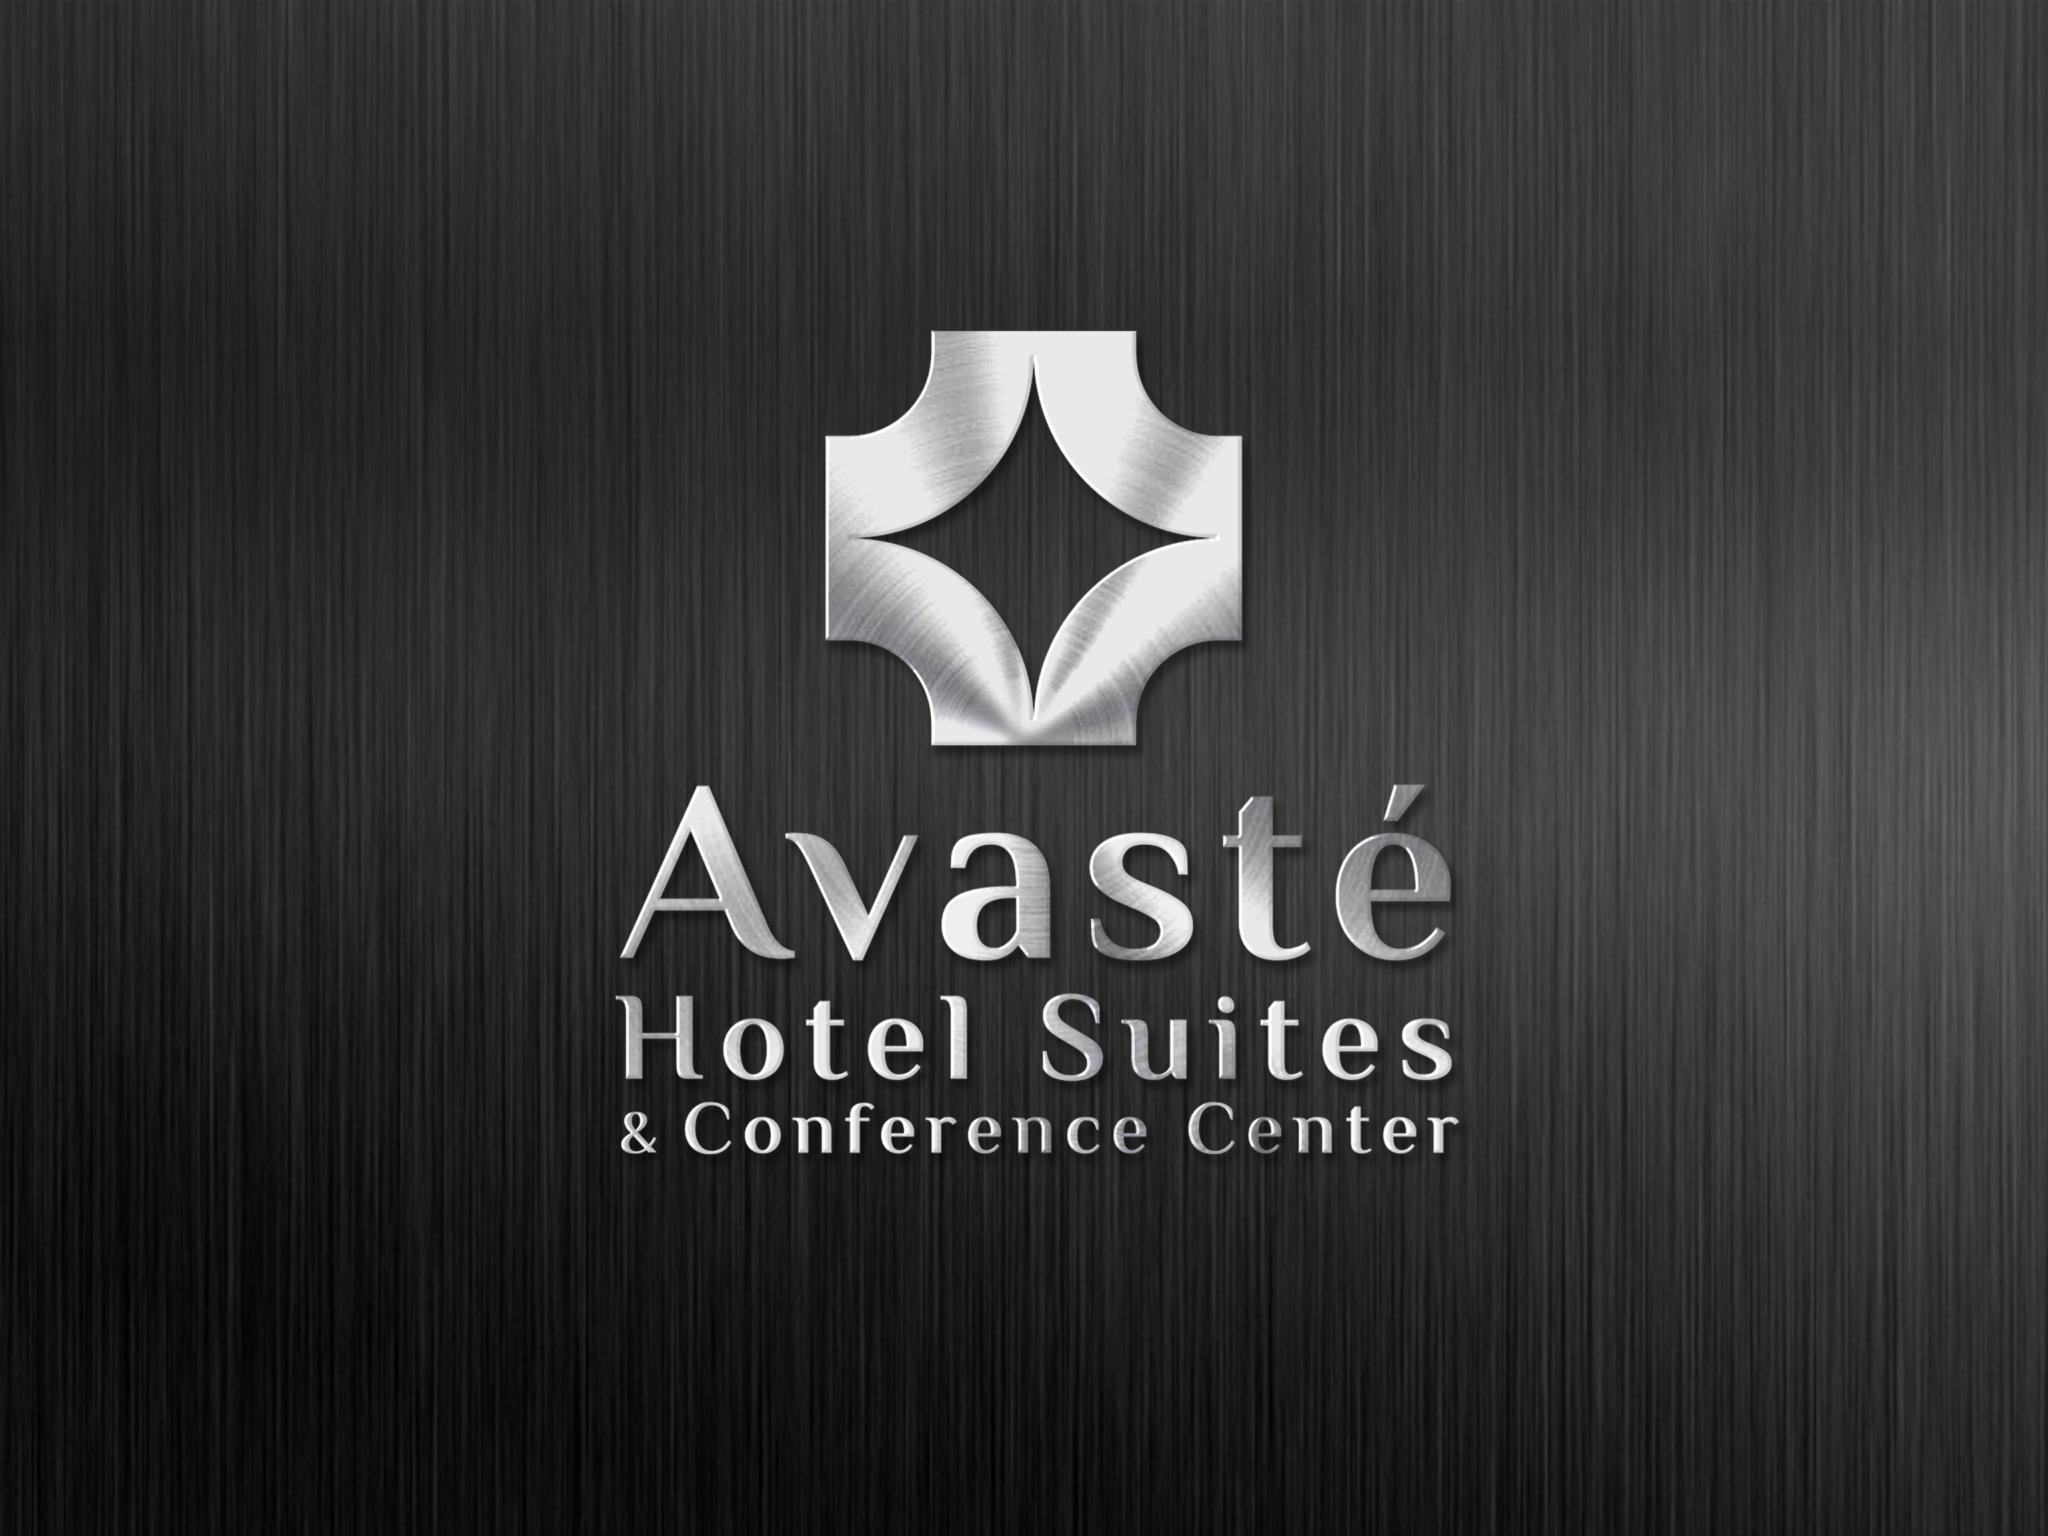 Avaste Hotel Suites & Conference Center, Lyon